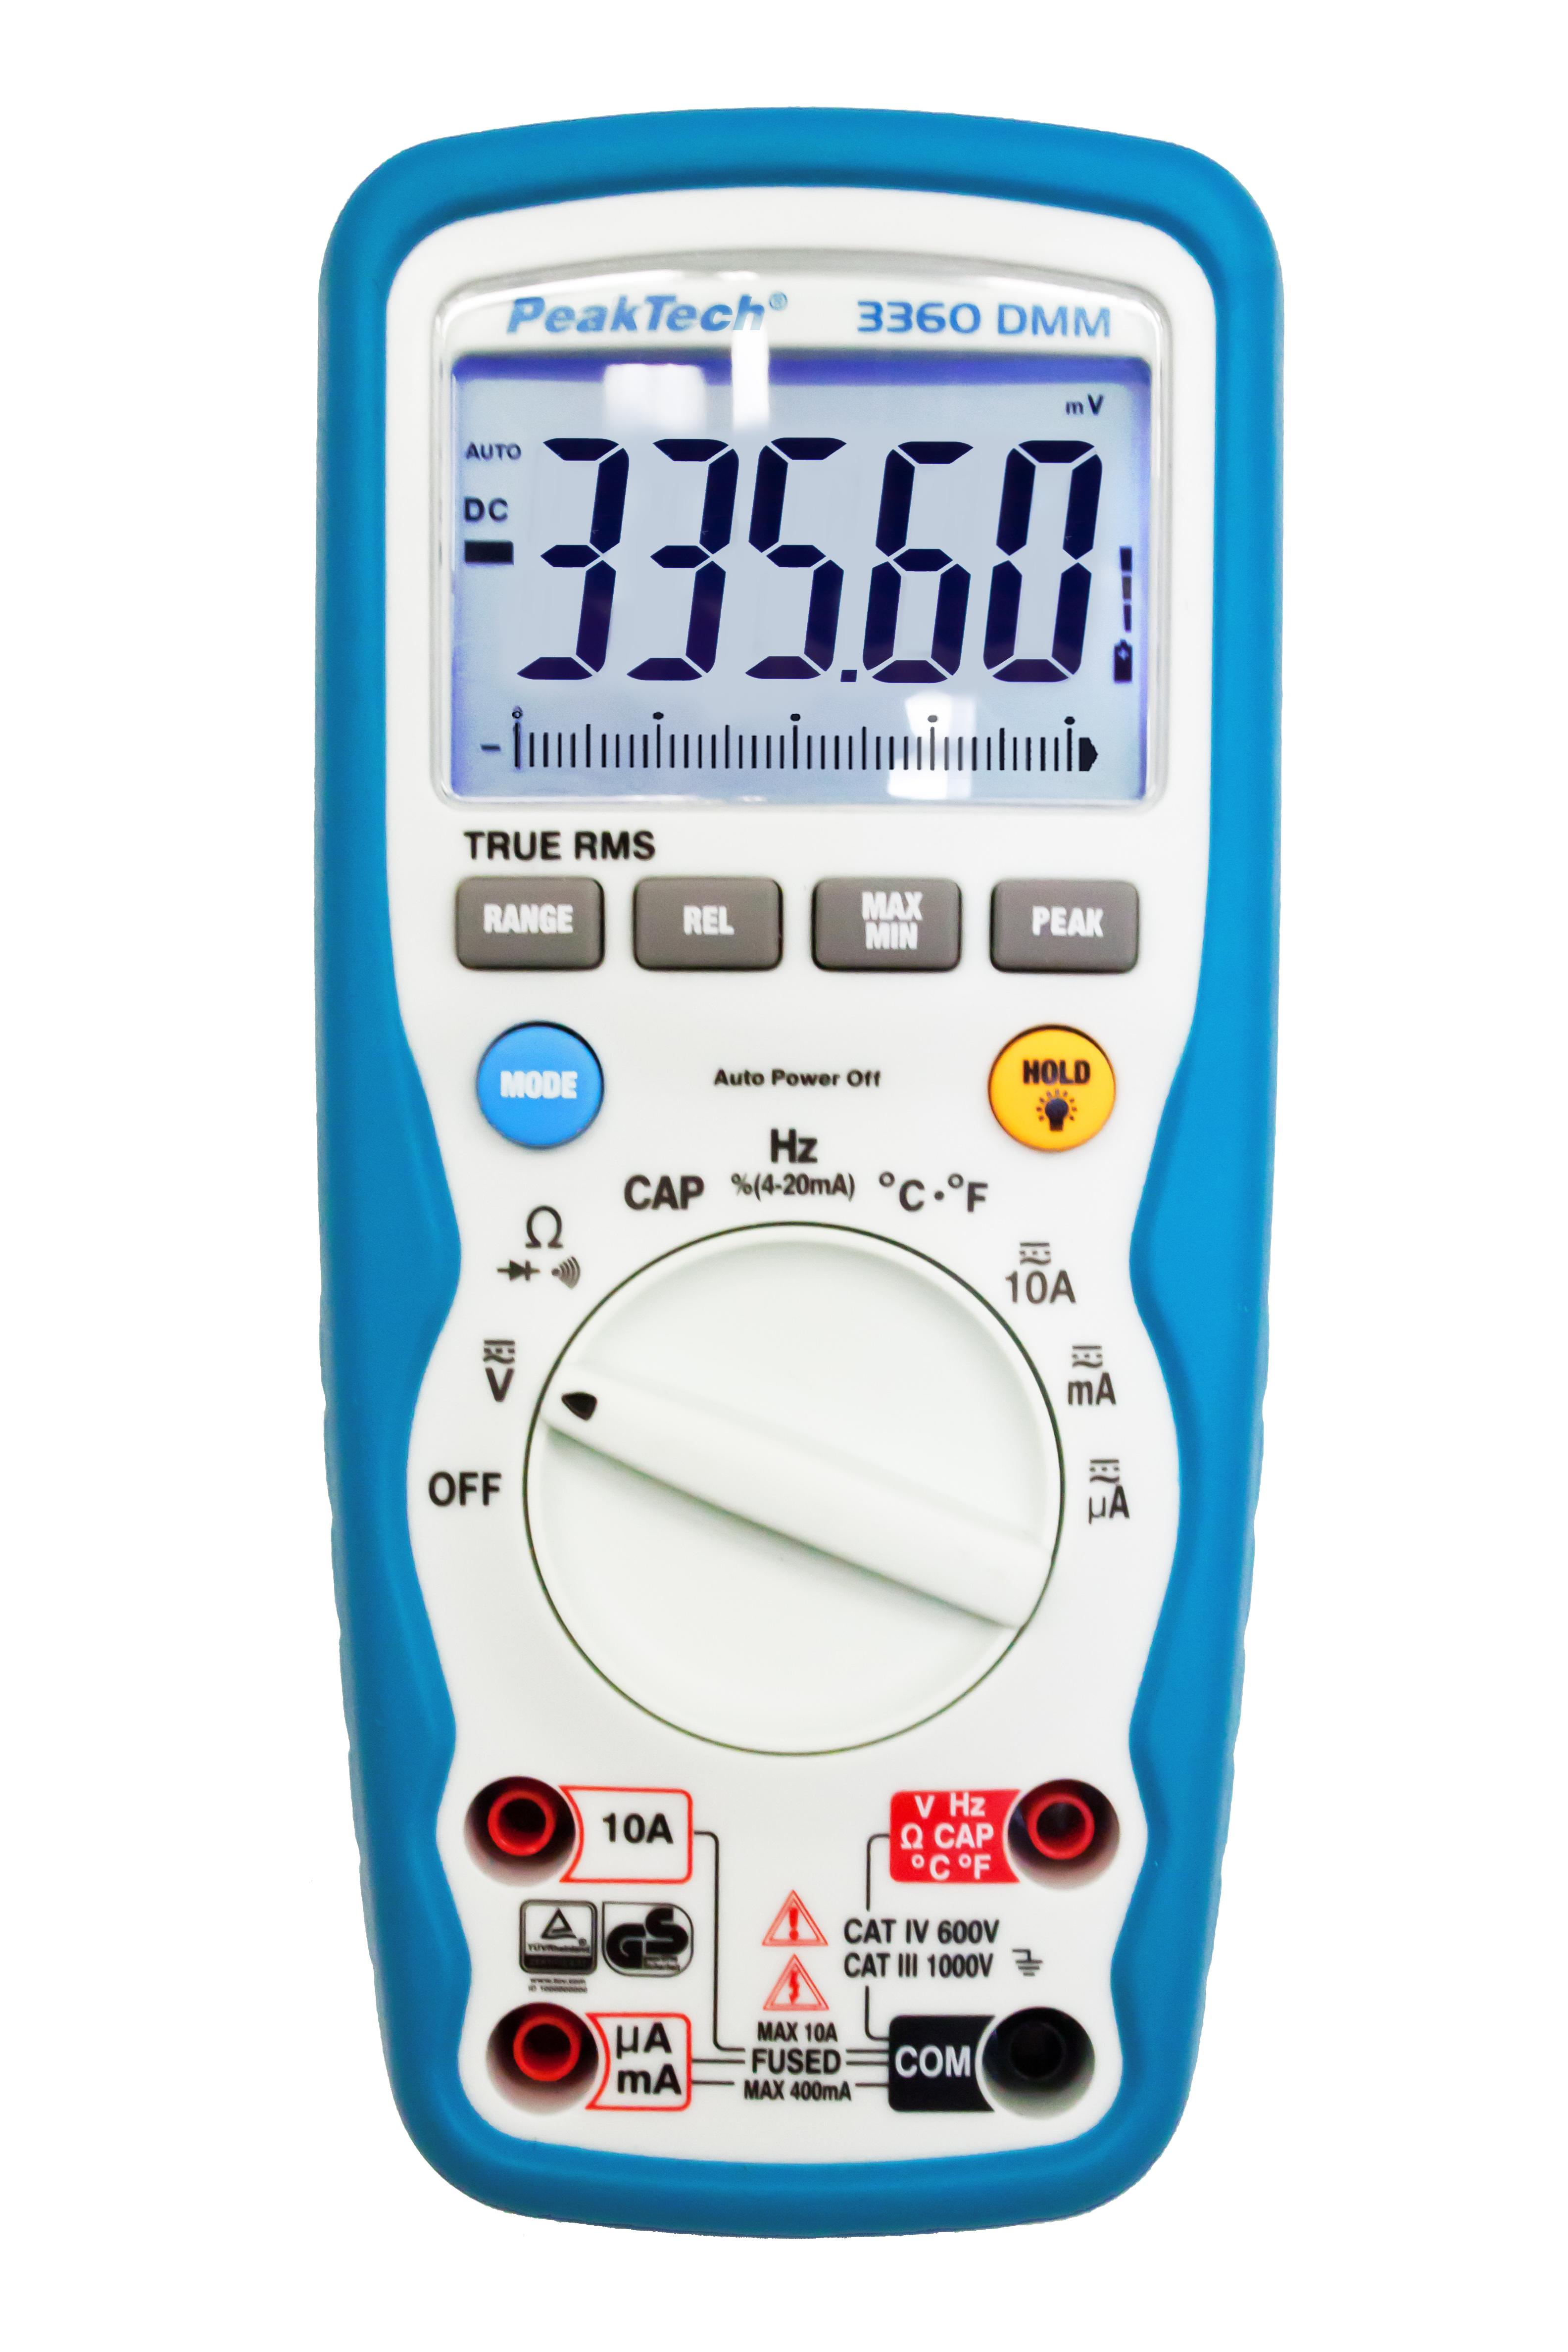 «PeakTech® P 3360» Digital multimeter, 40,000 counts, IP67 & TrueRMS